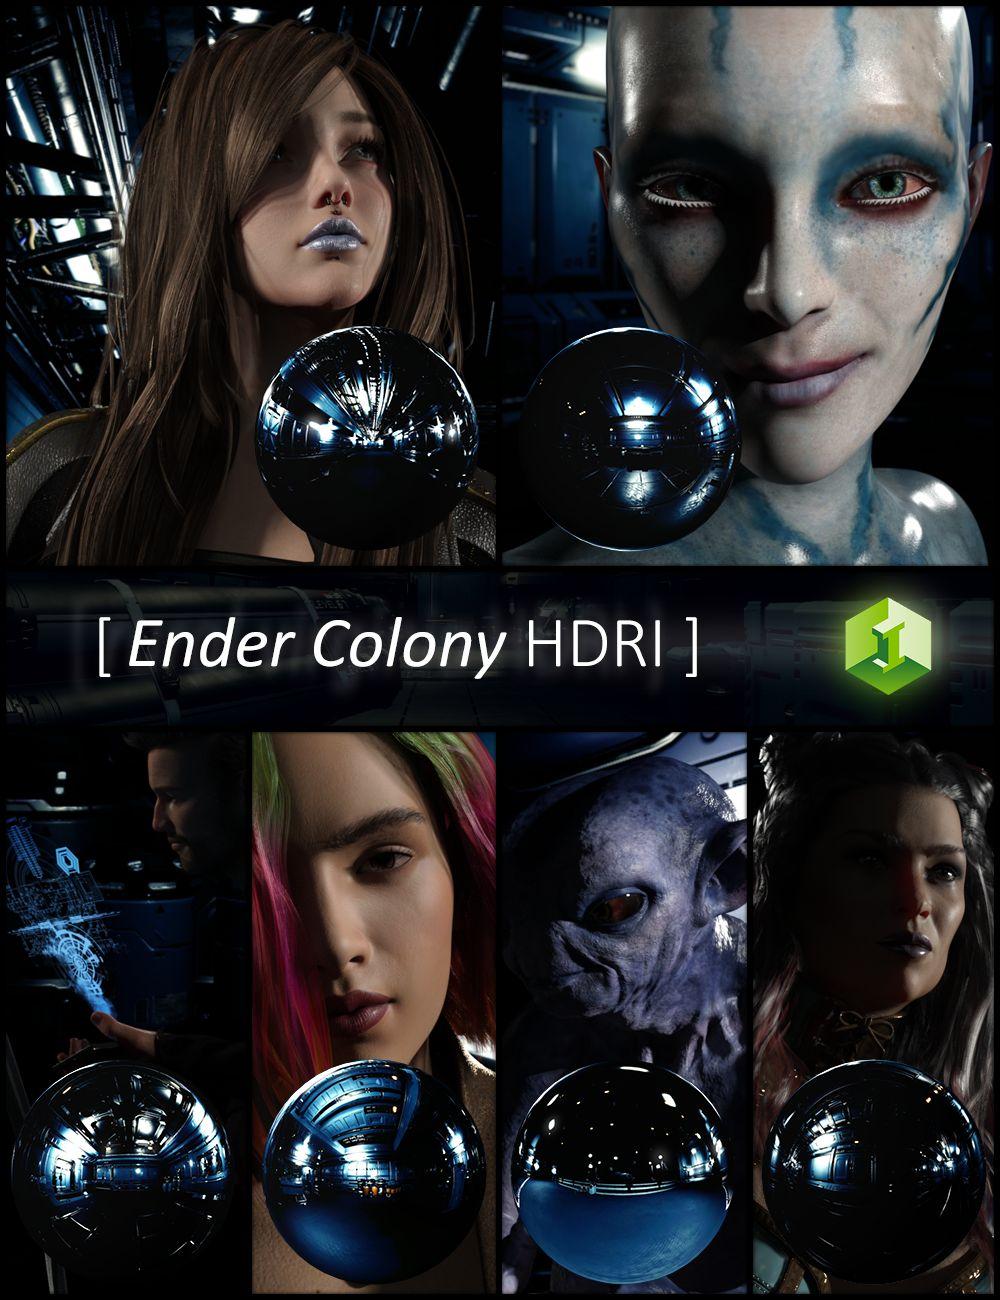 Ender Colony HDRI by: JDA HDRI, 3D Models by Daz 3D